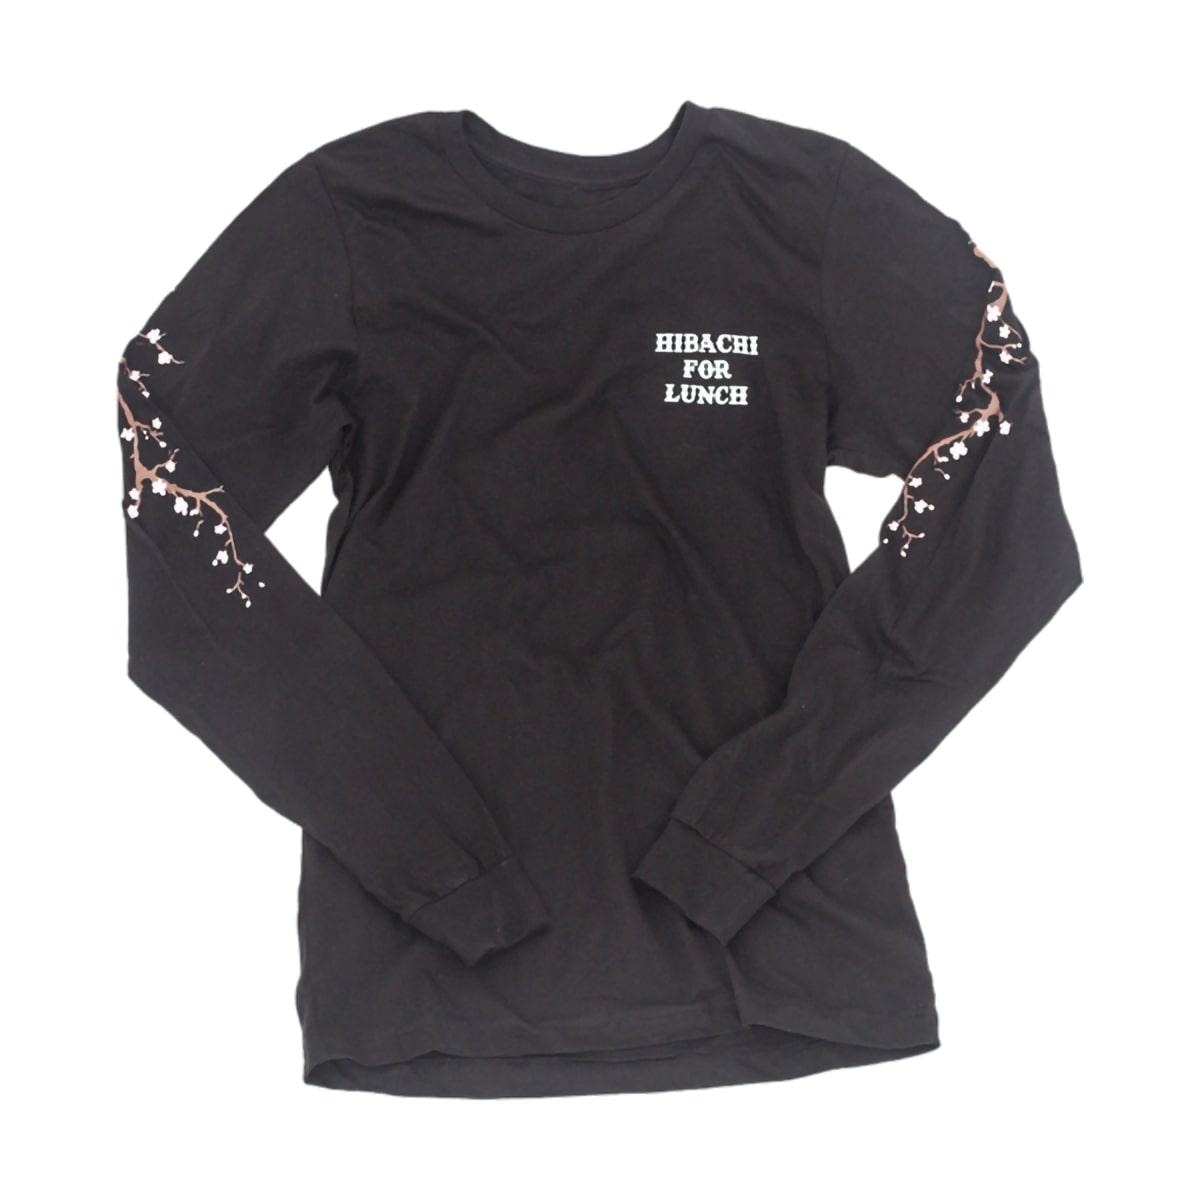 Hibachi for Lunch Long Sleeve Shirt [Black]